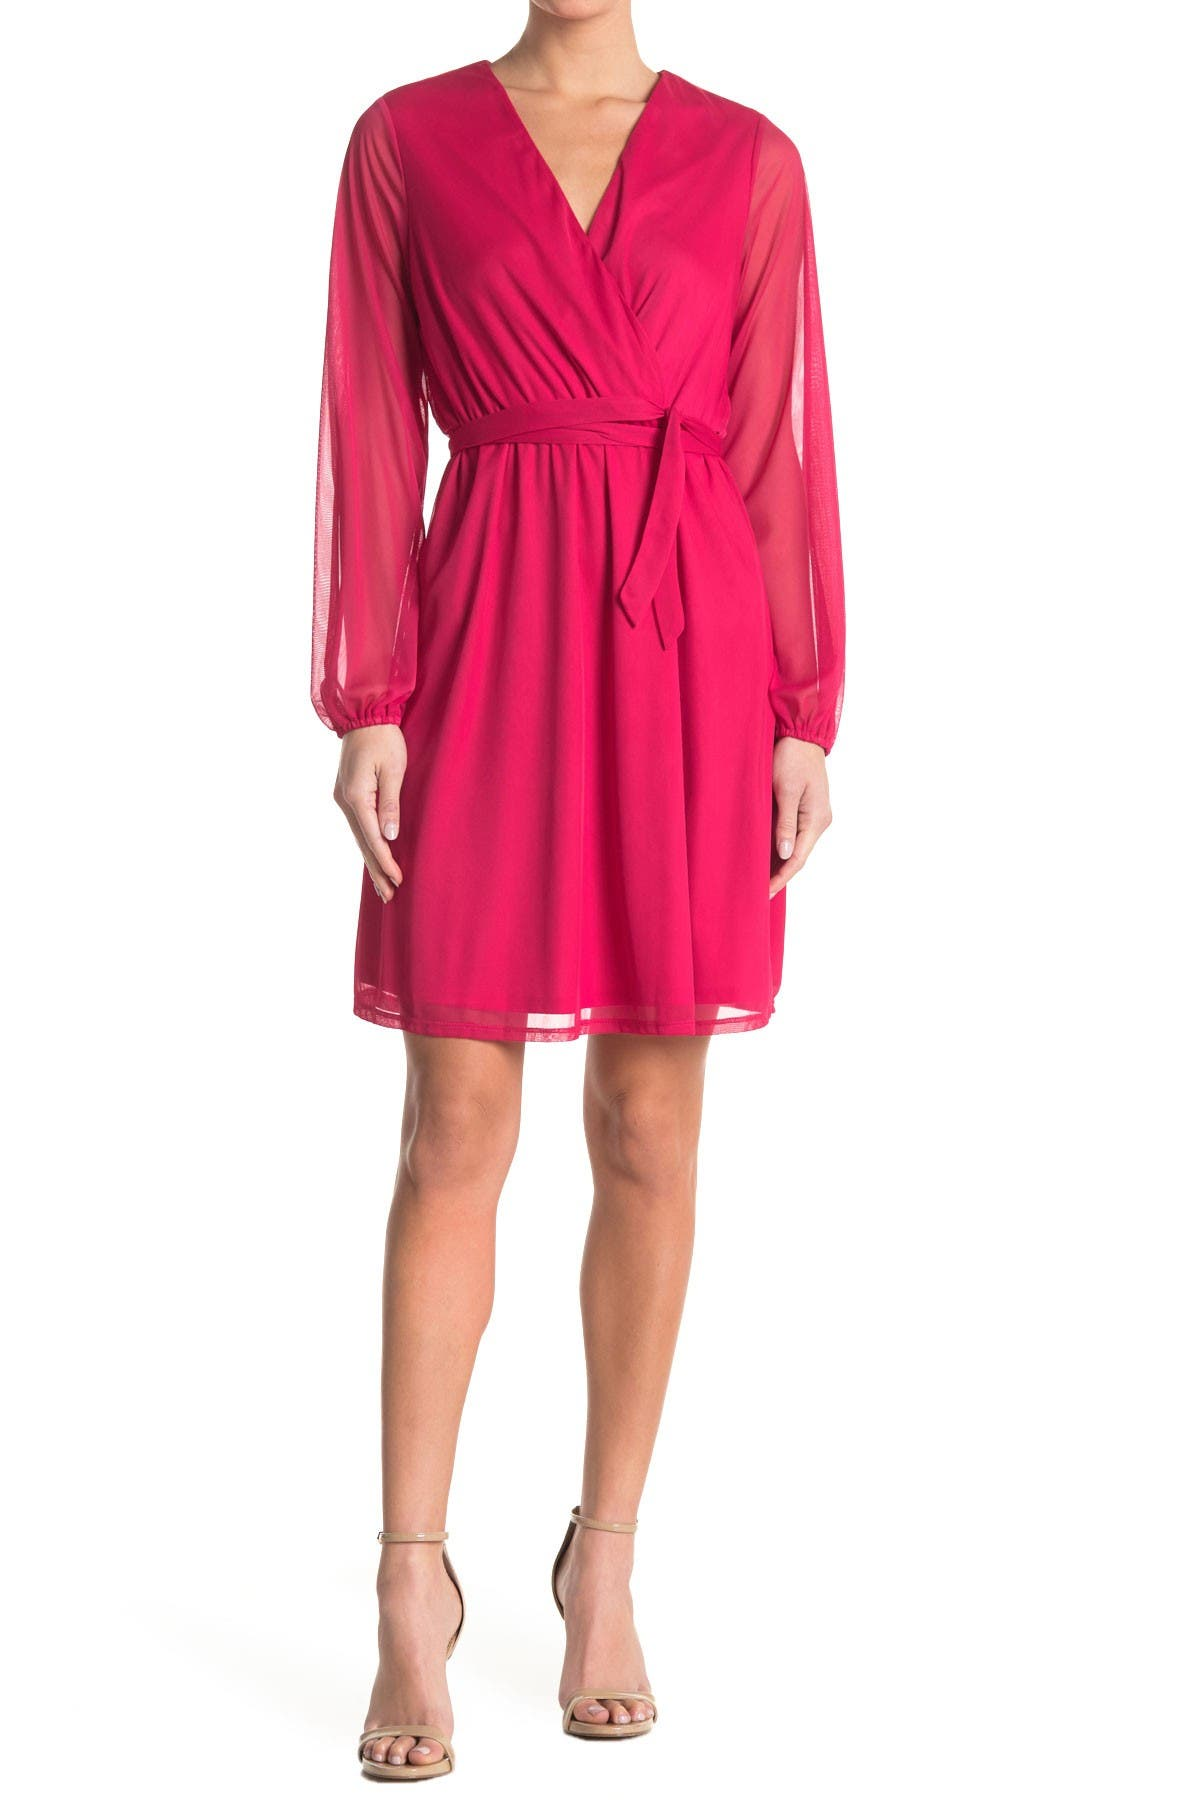 Image of TASH + SOPHIE Surplice Long Sleeve Chiffon Dress